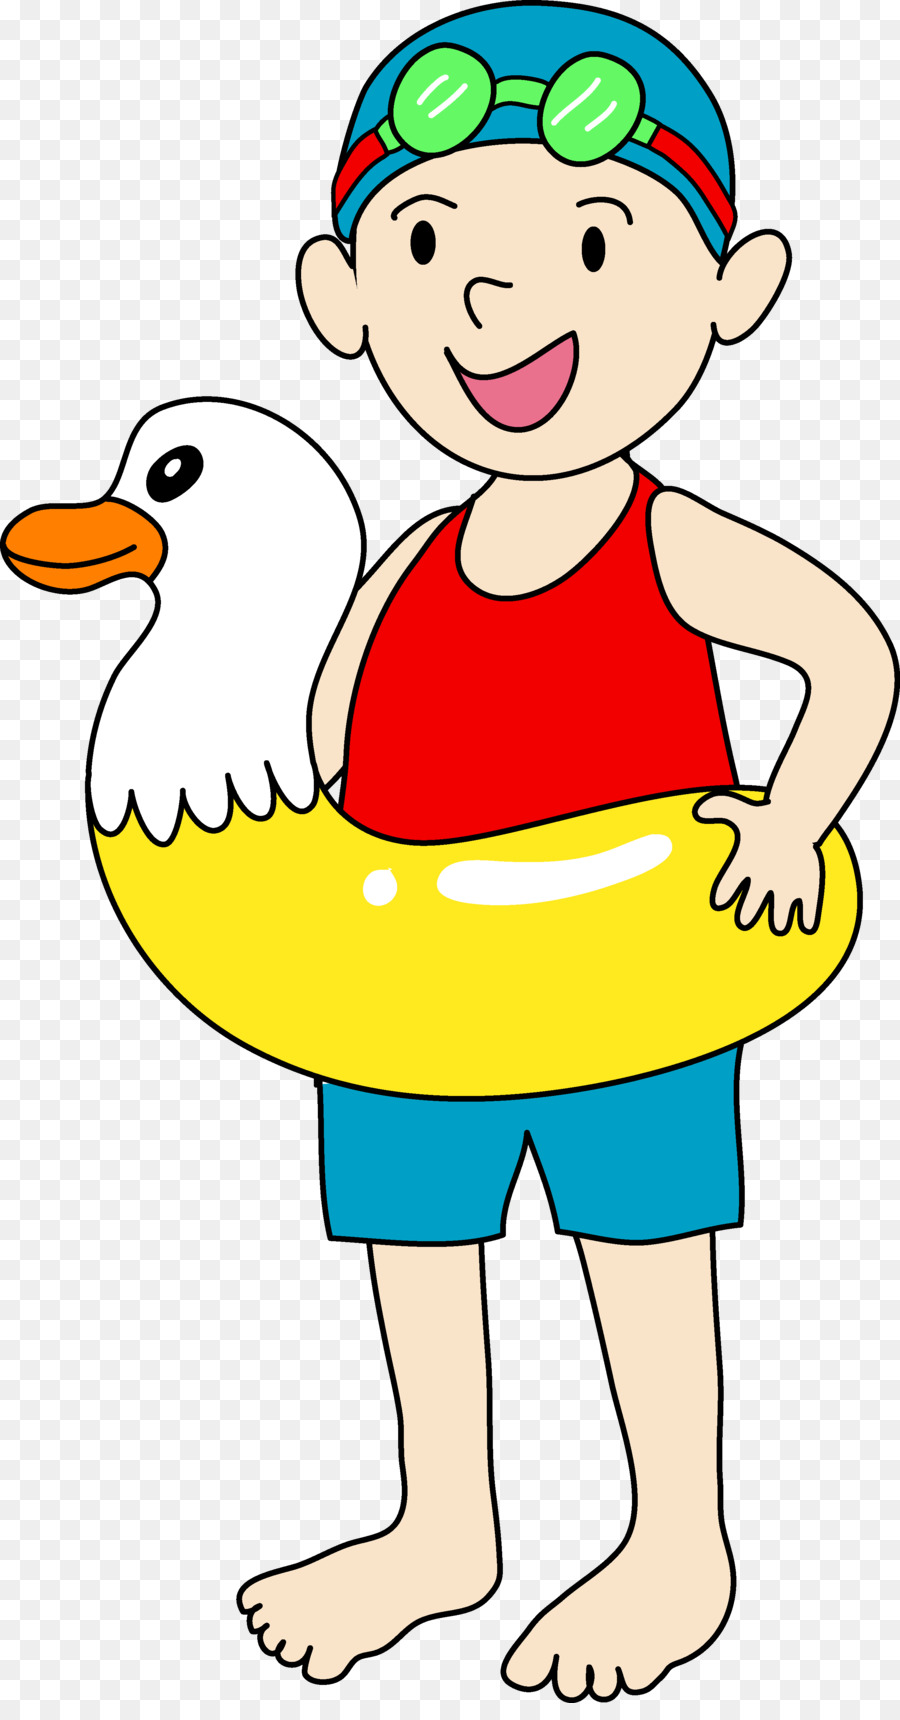 900x1720 Water Park Water Slide Swimming Pool Clip Art